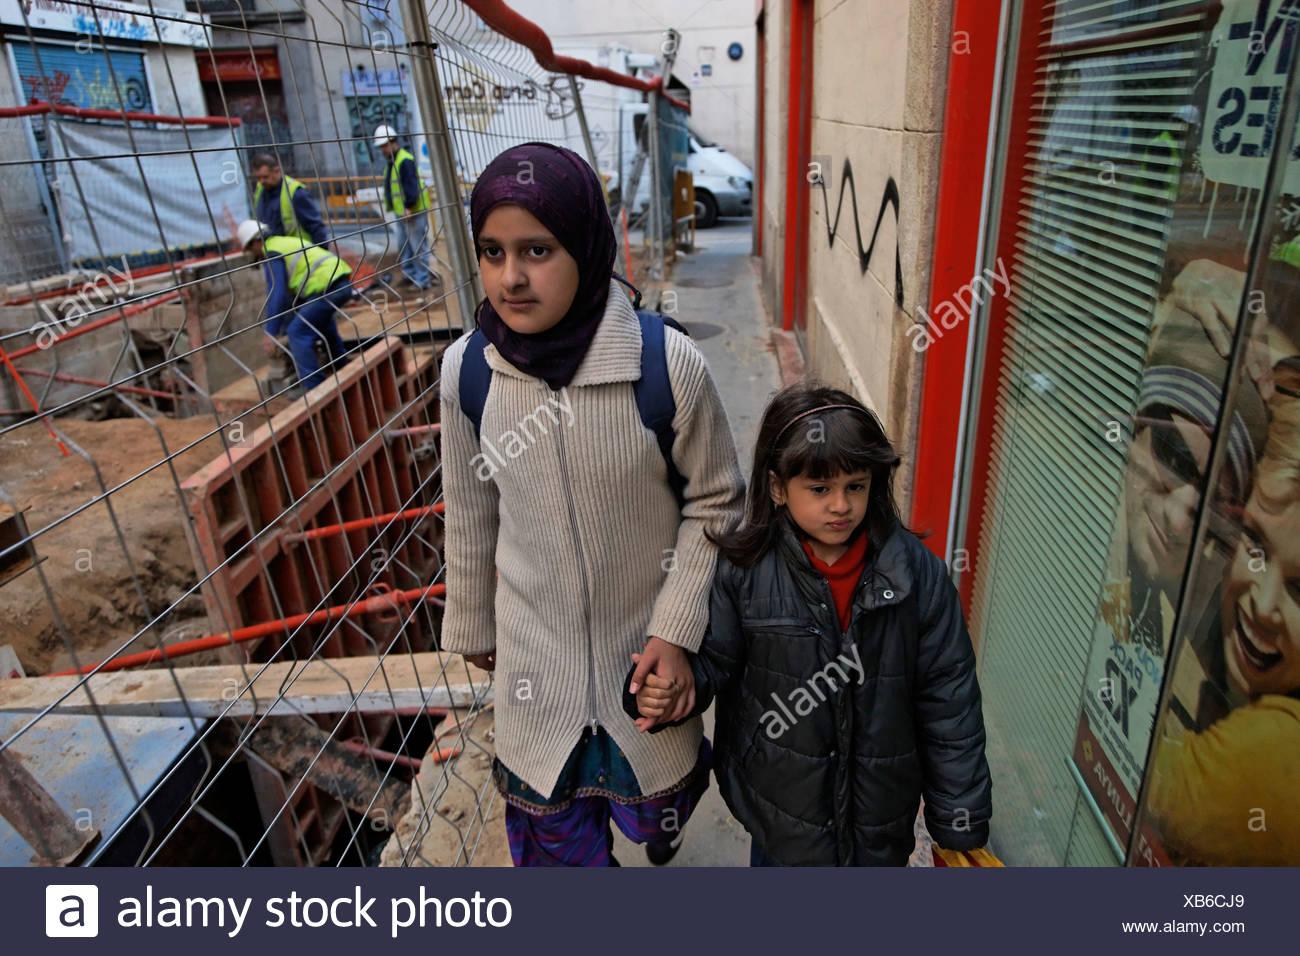 Immigrant children in Barcelona's Rambla de Raval. - Stock Image